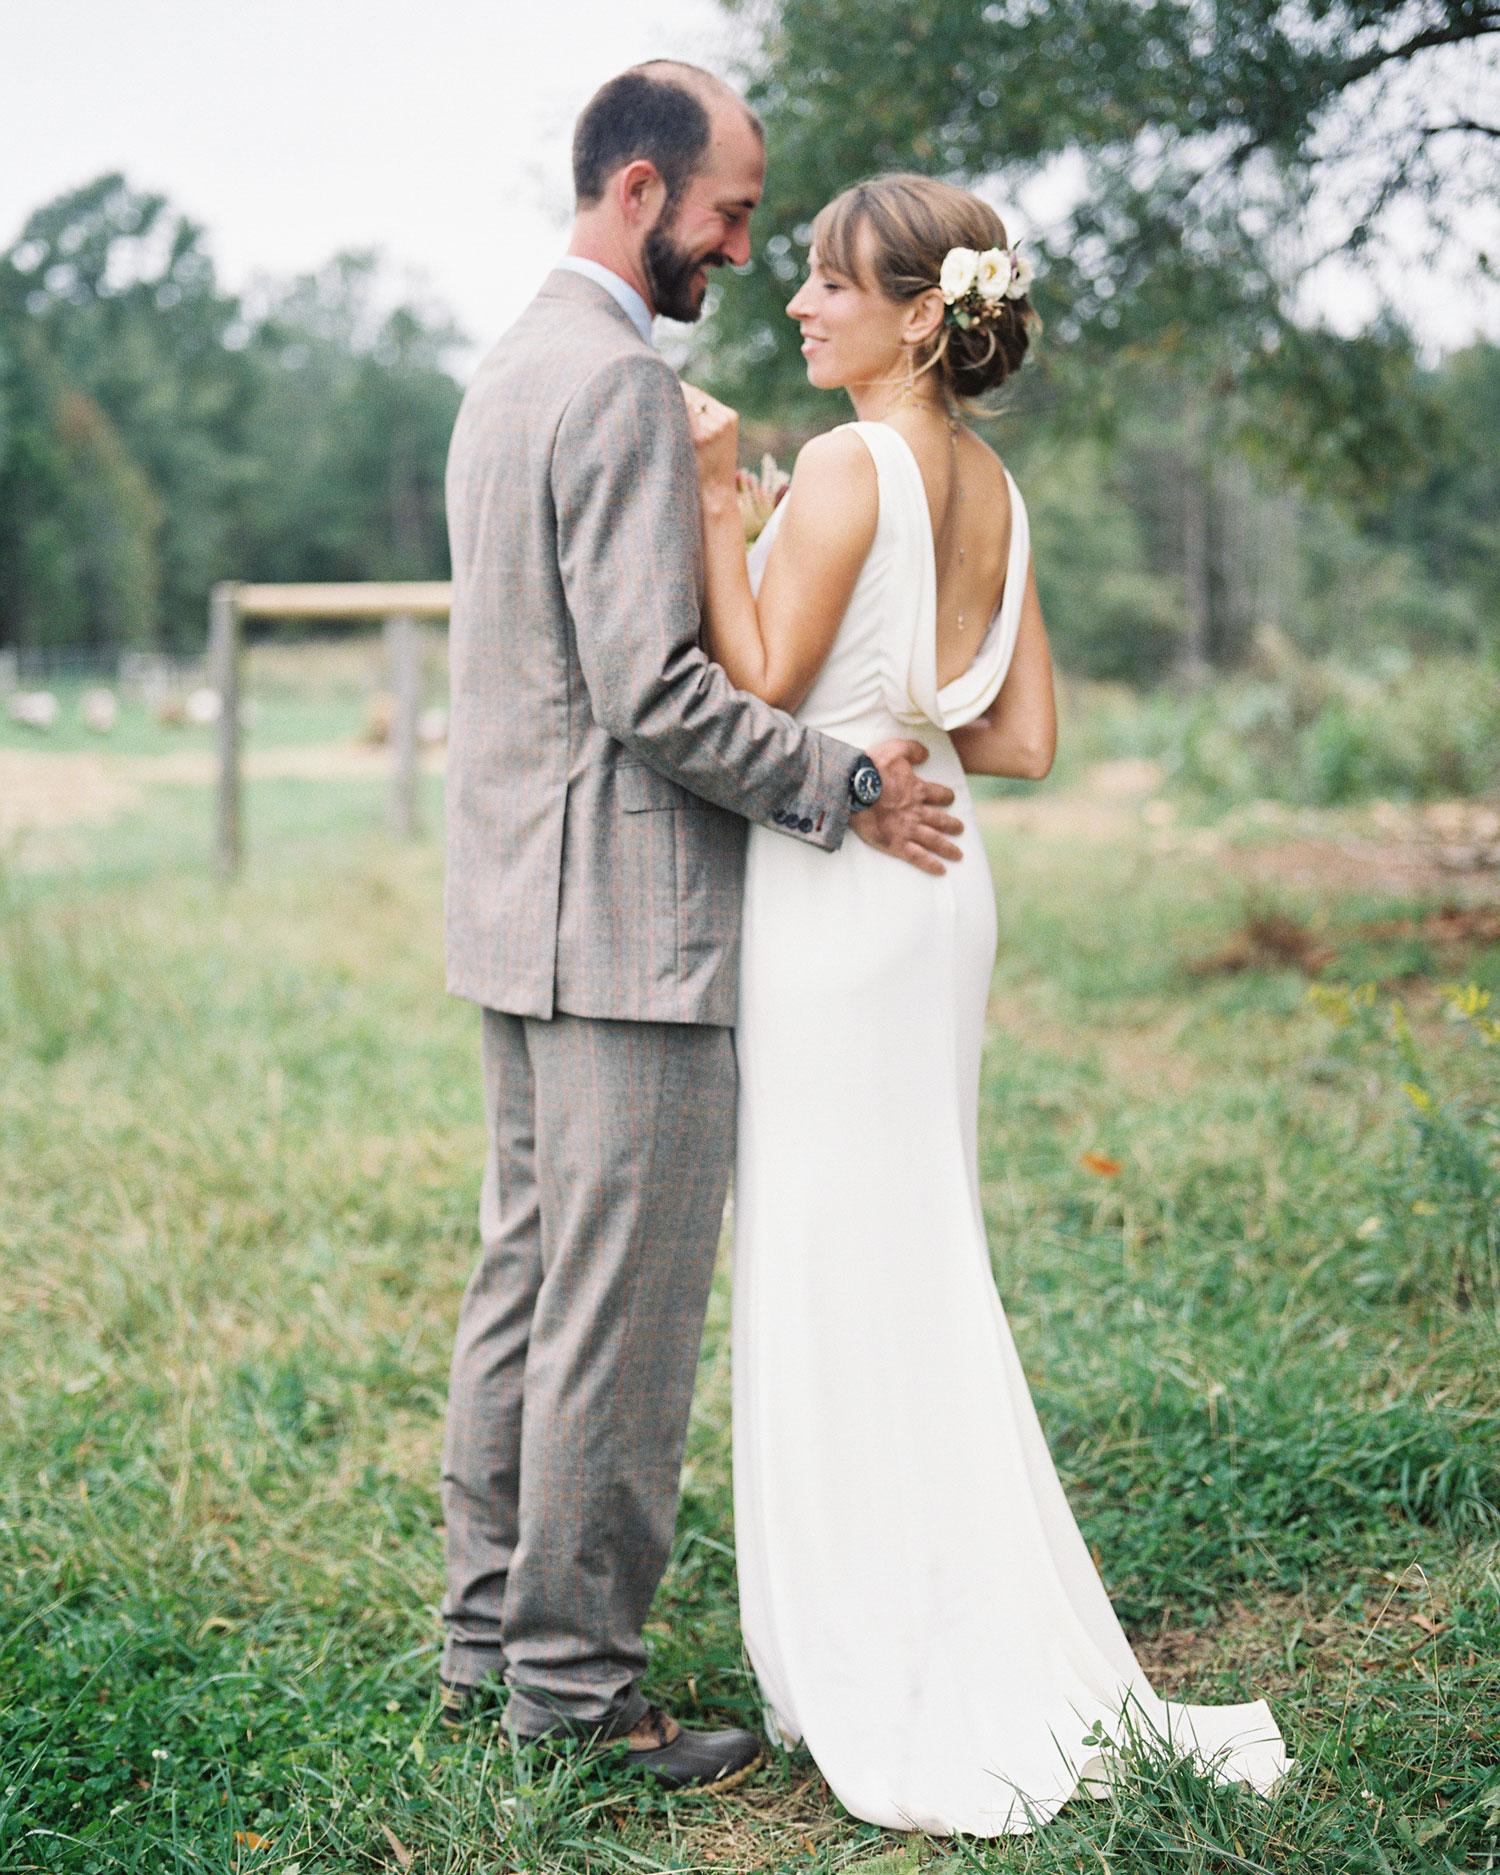 stephanie-mike-wedding-north-carolina-couple-04-s112048.jpg